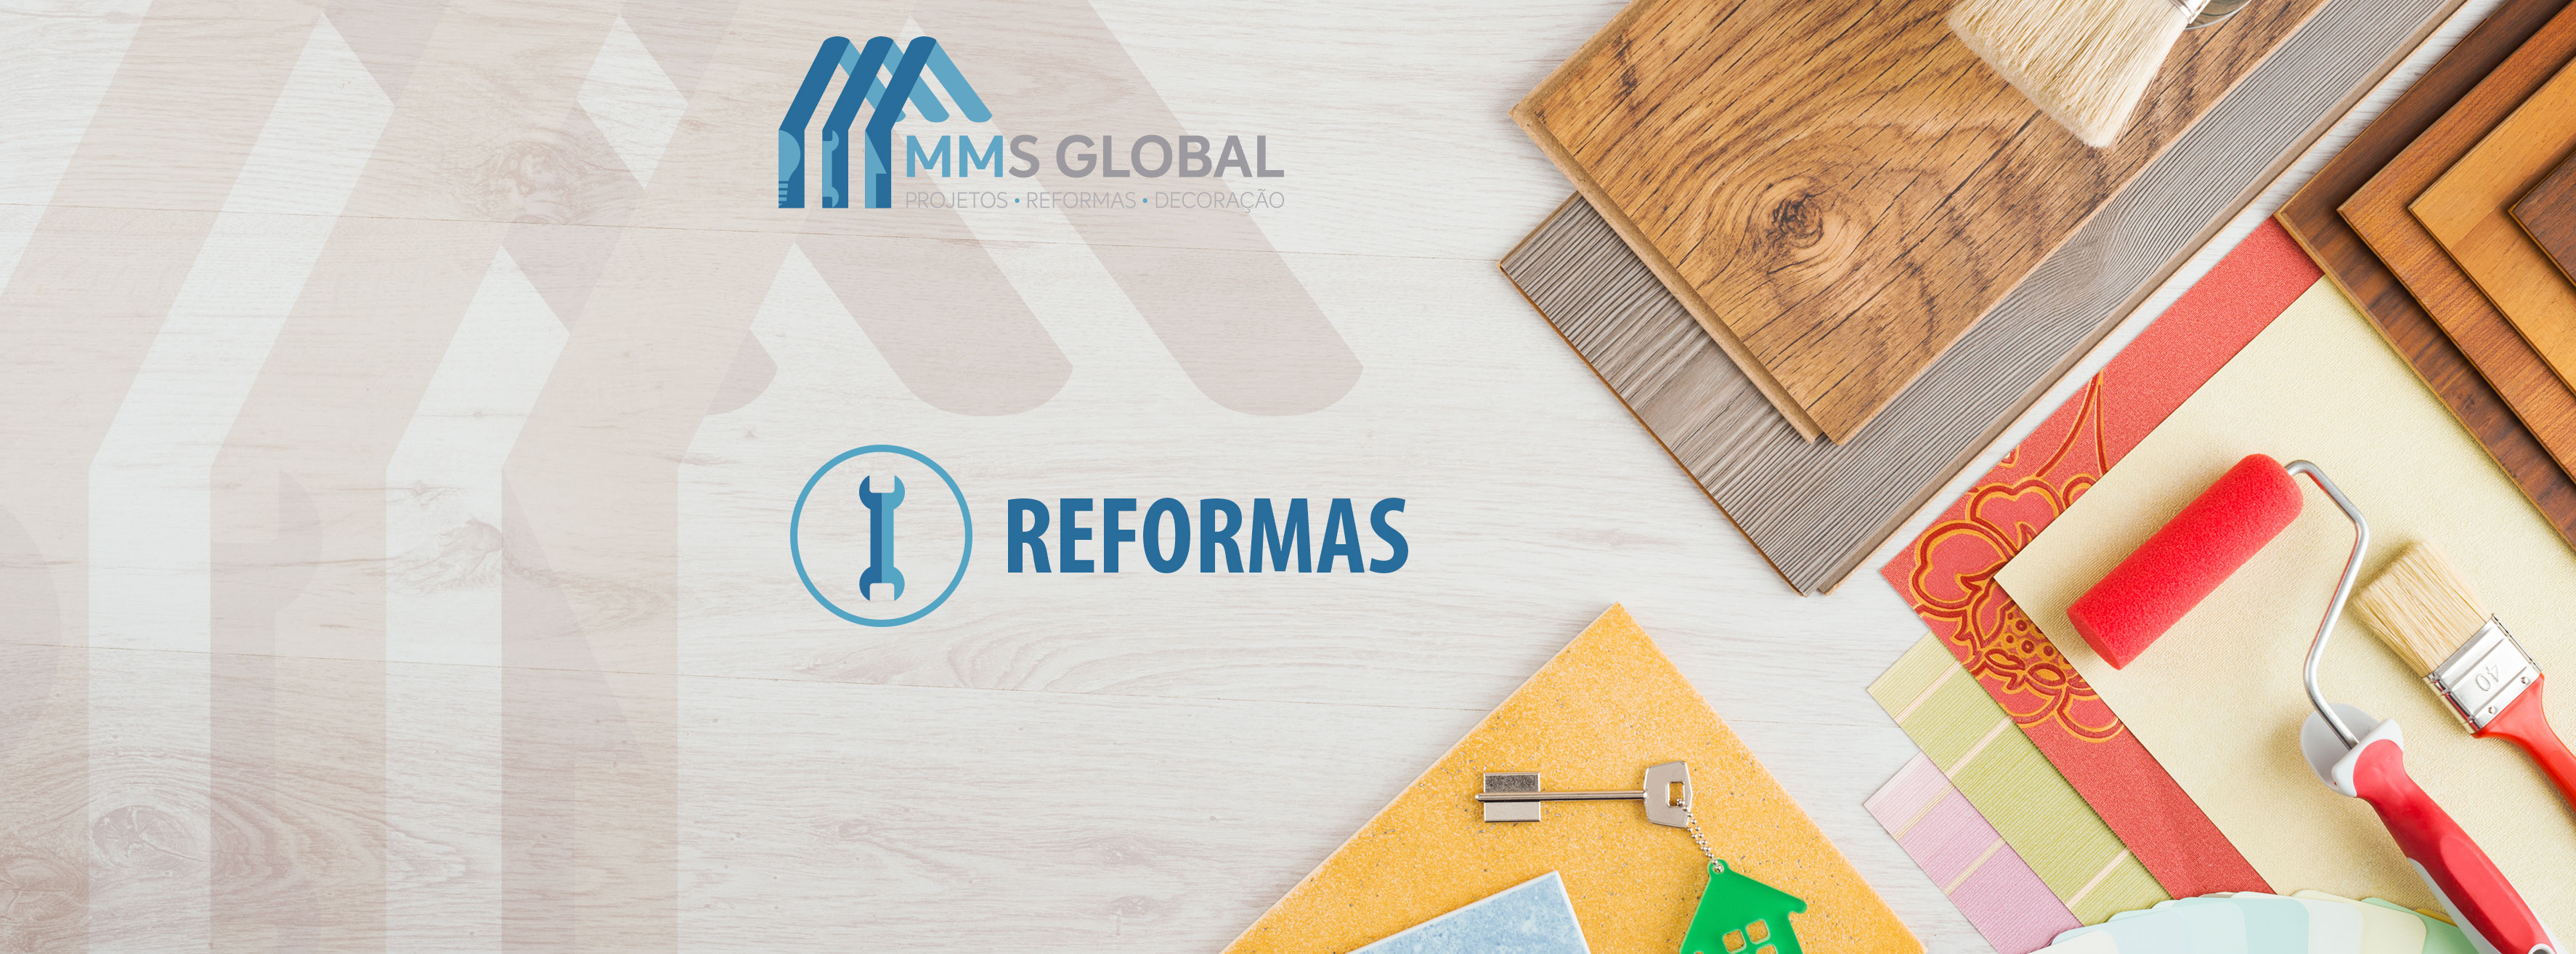 slide-mmsglobal-reformas1